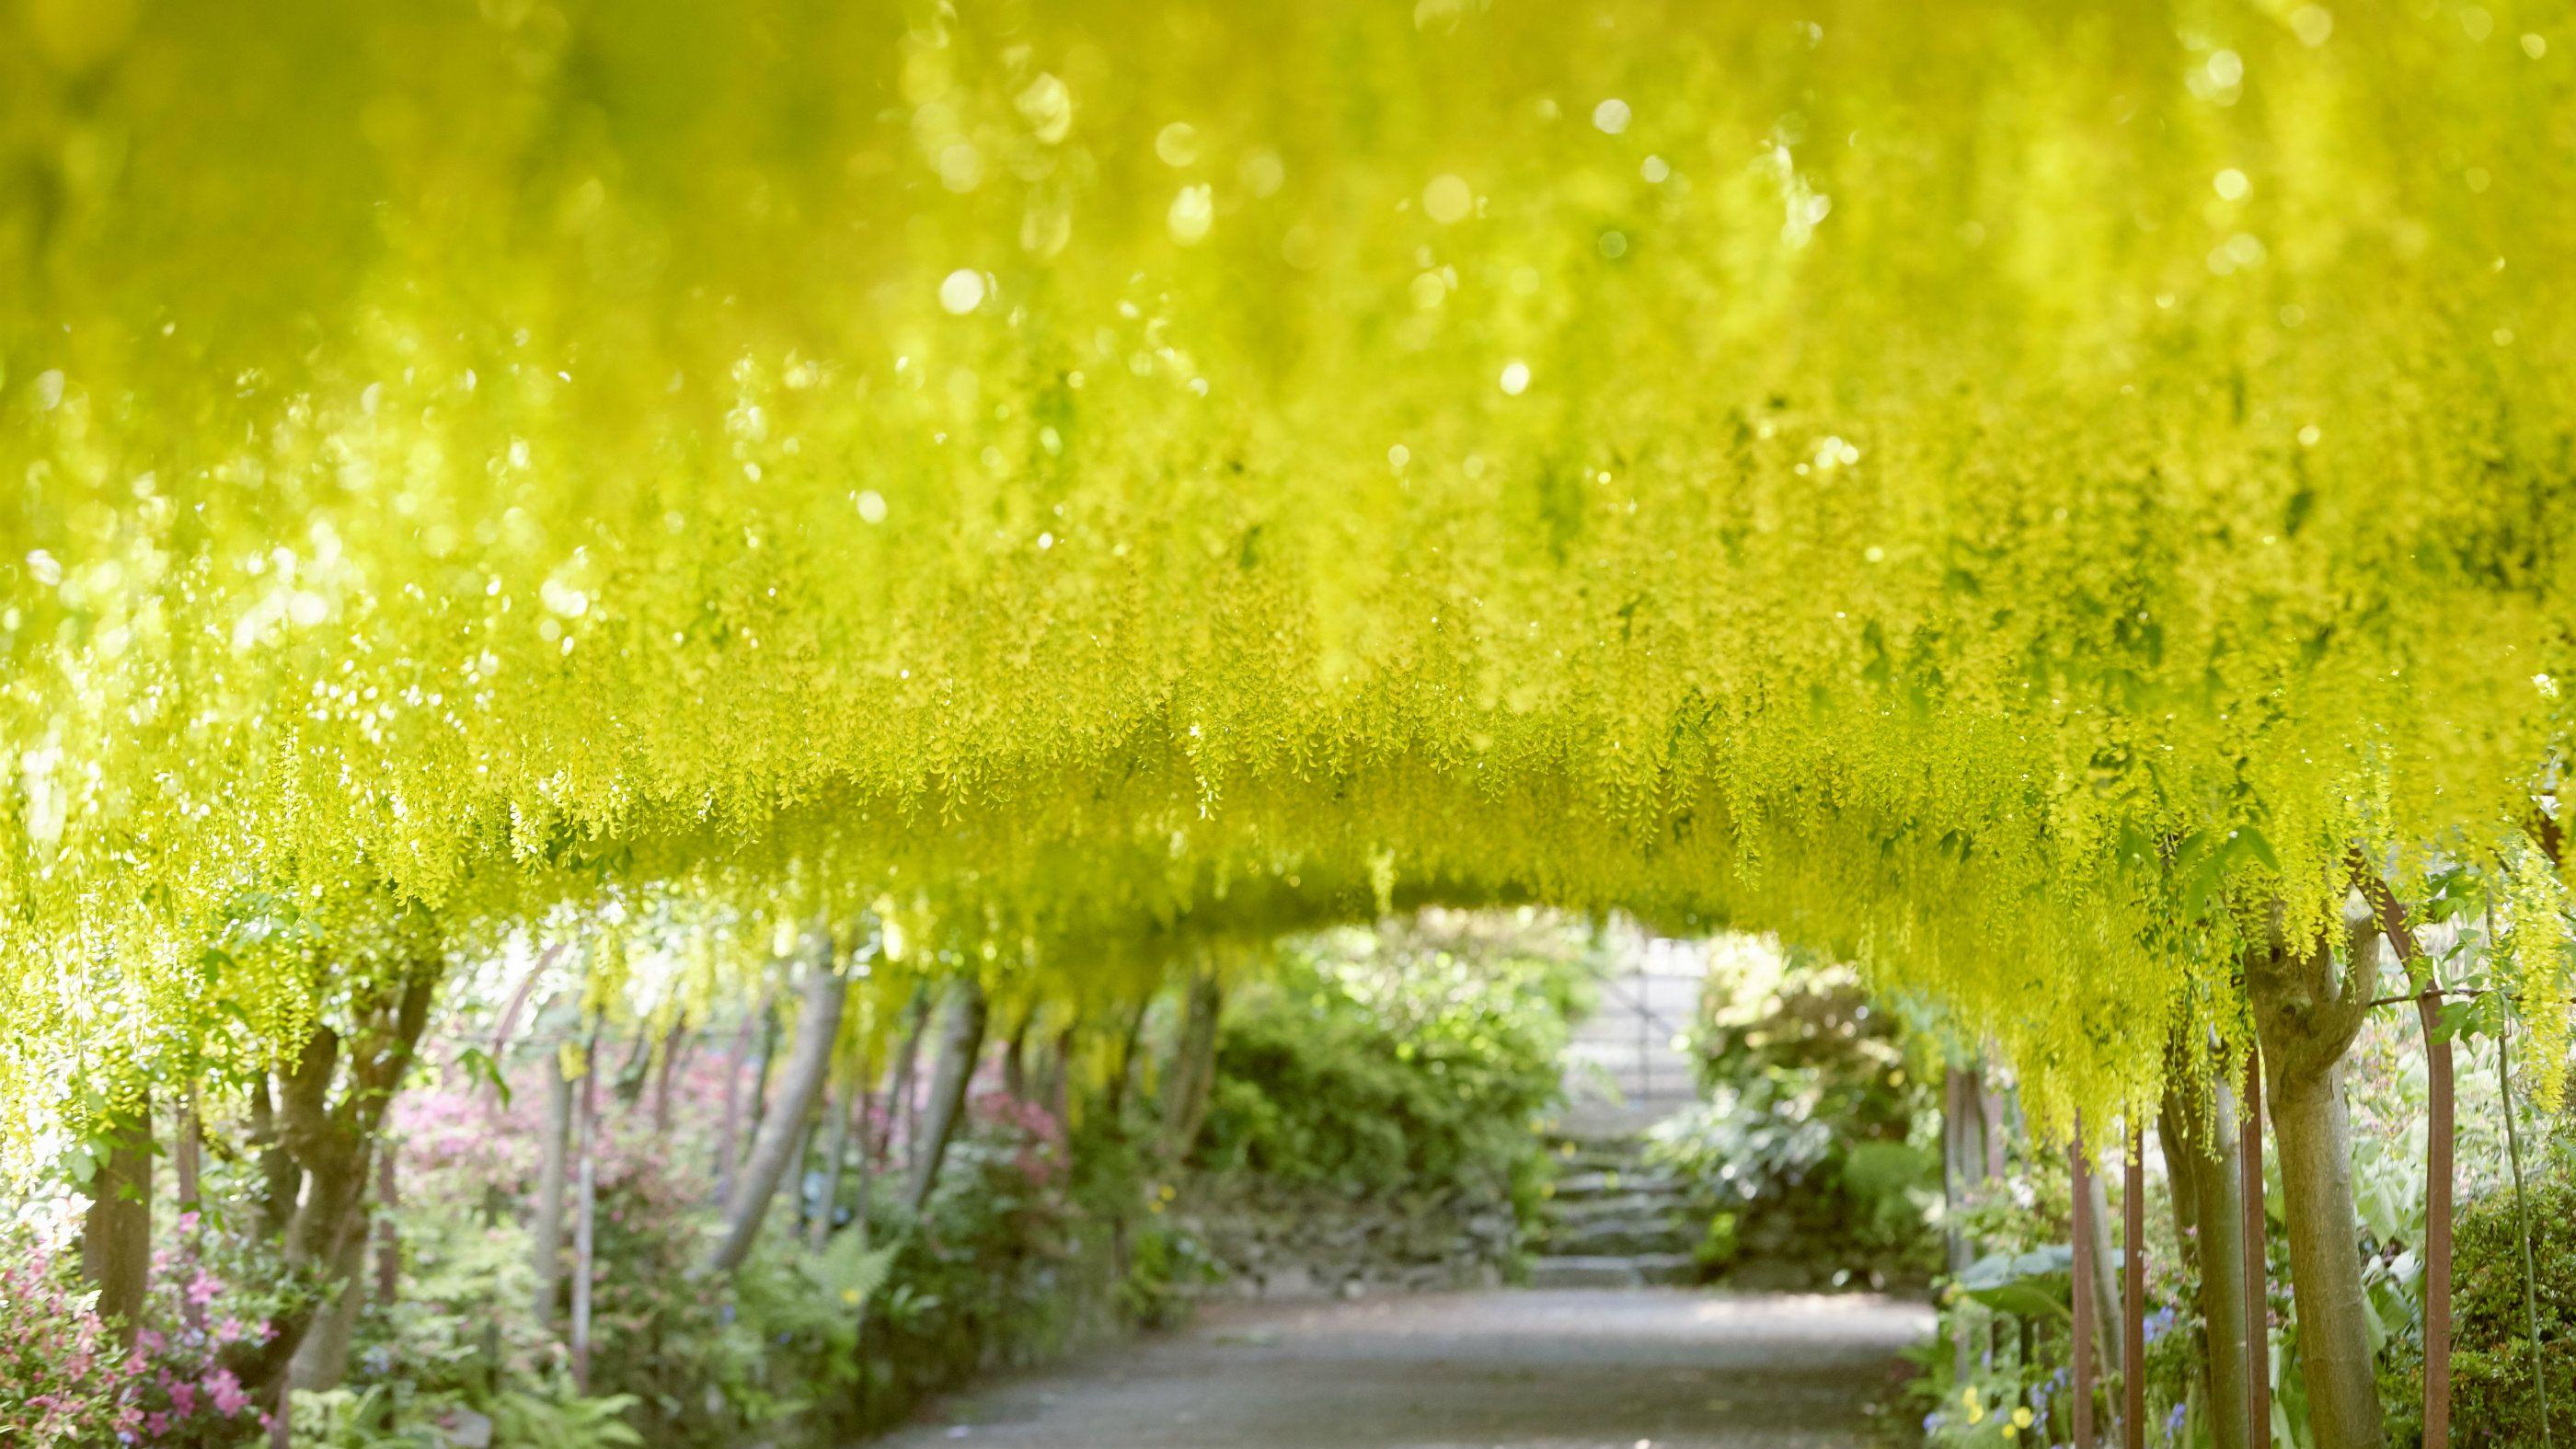 Visit the National Trust's Bodnant Garden, near Colwyn Bay, Wales